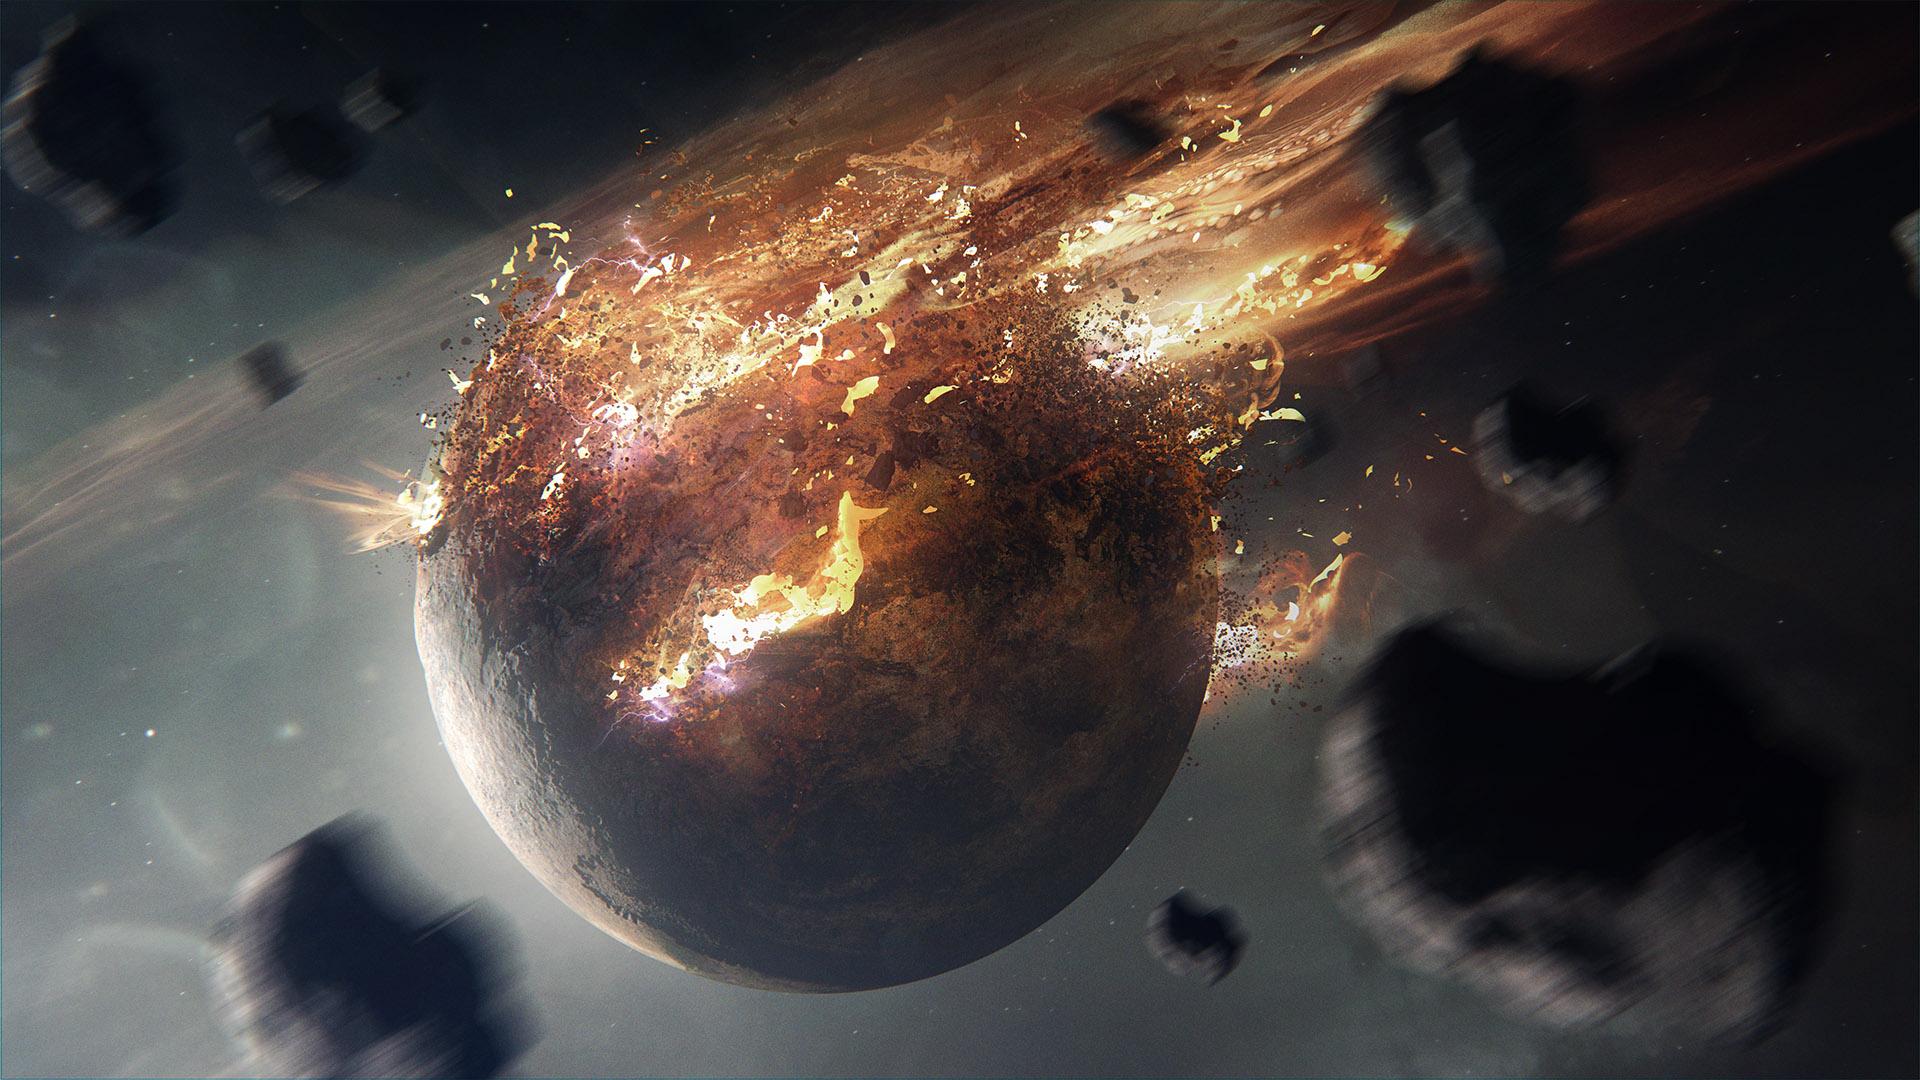 Erupting Planet